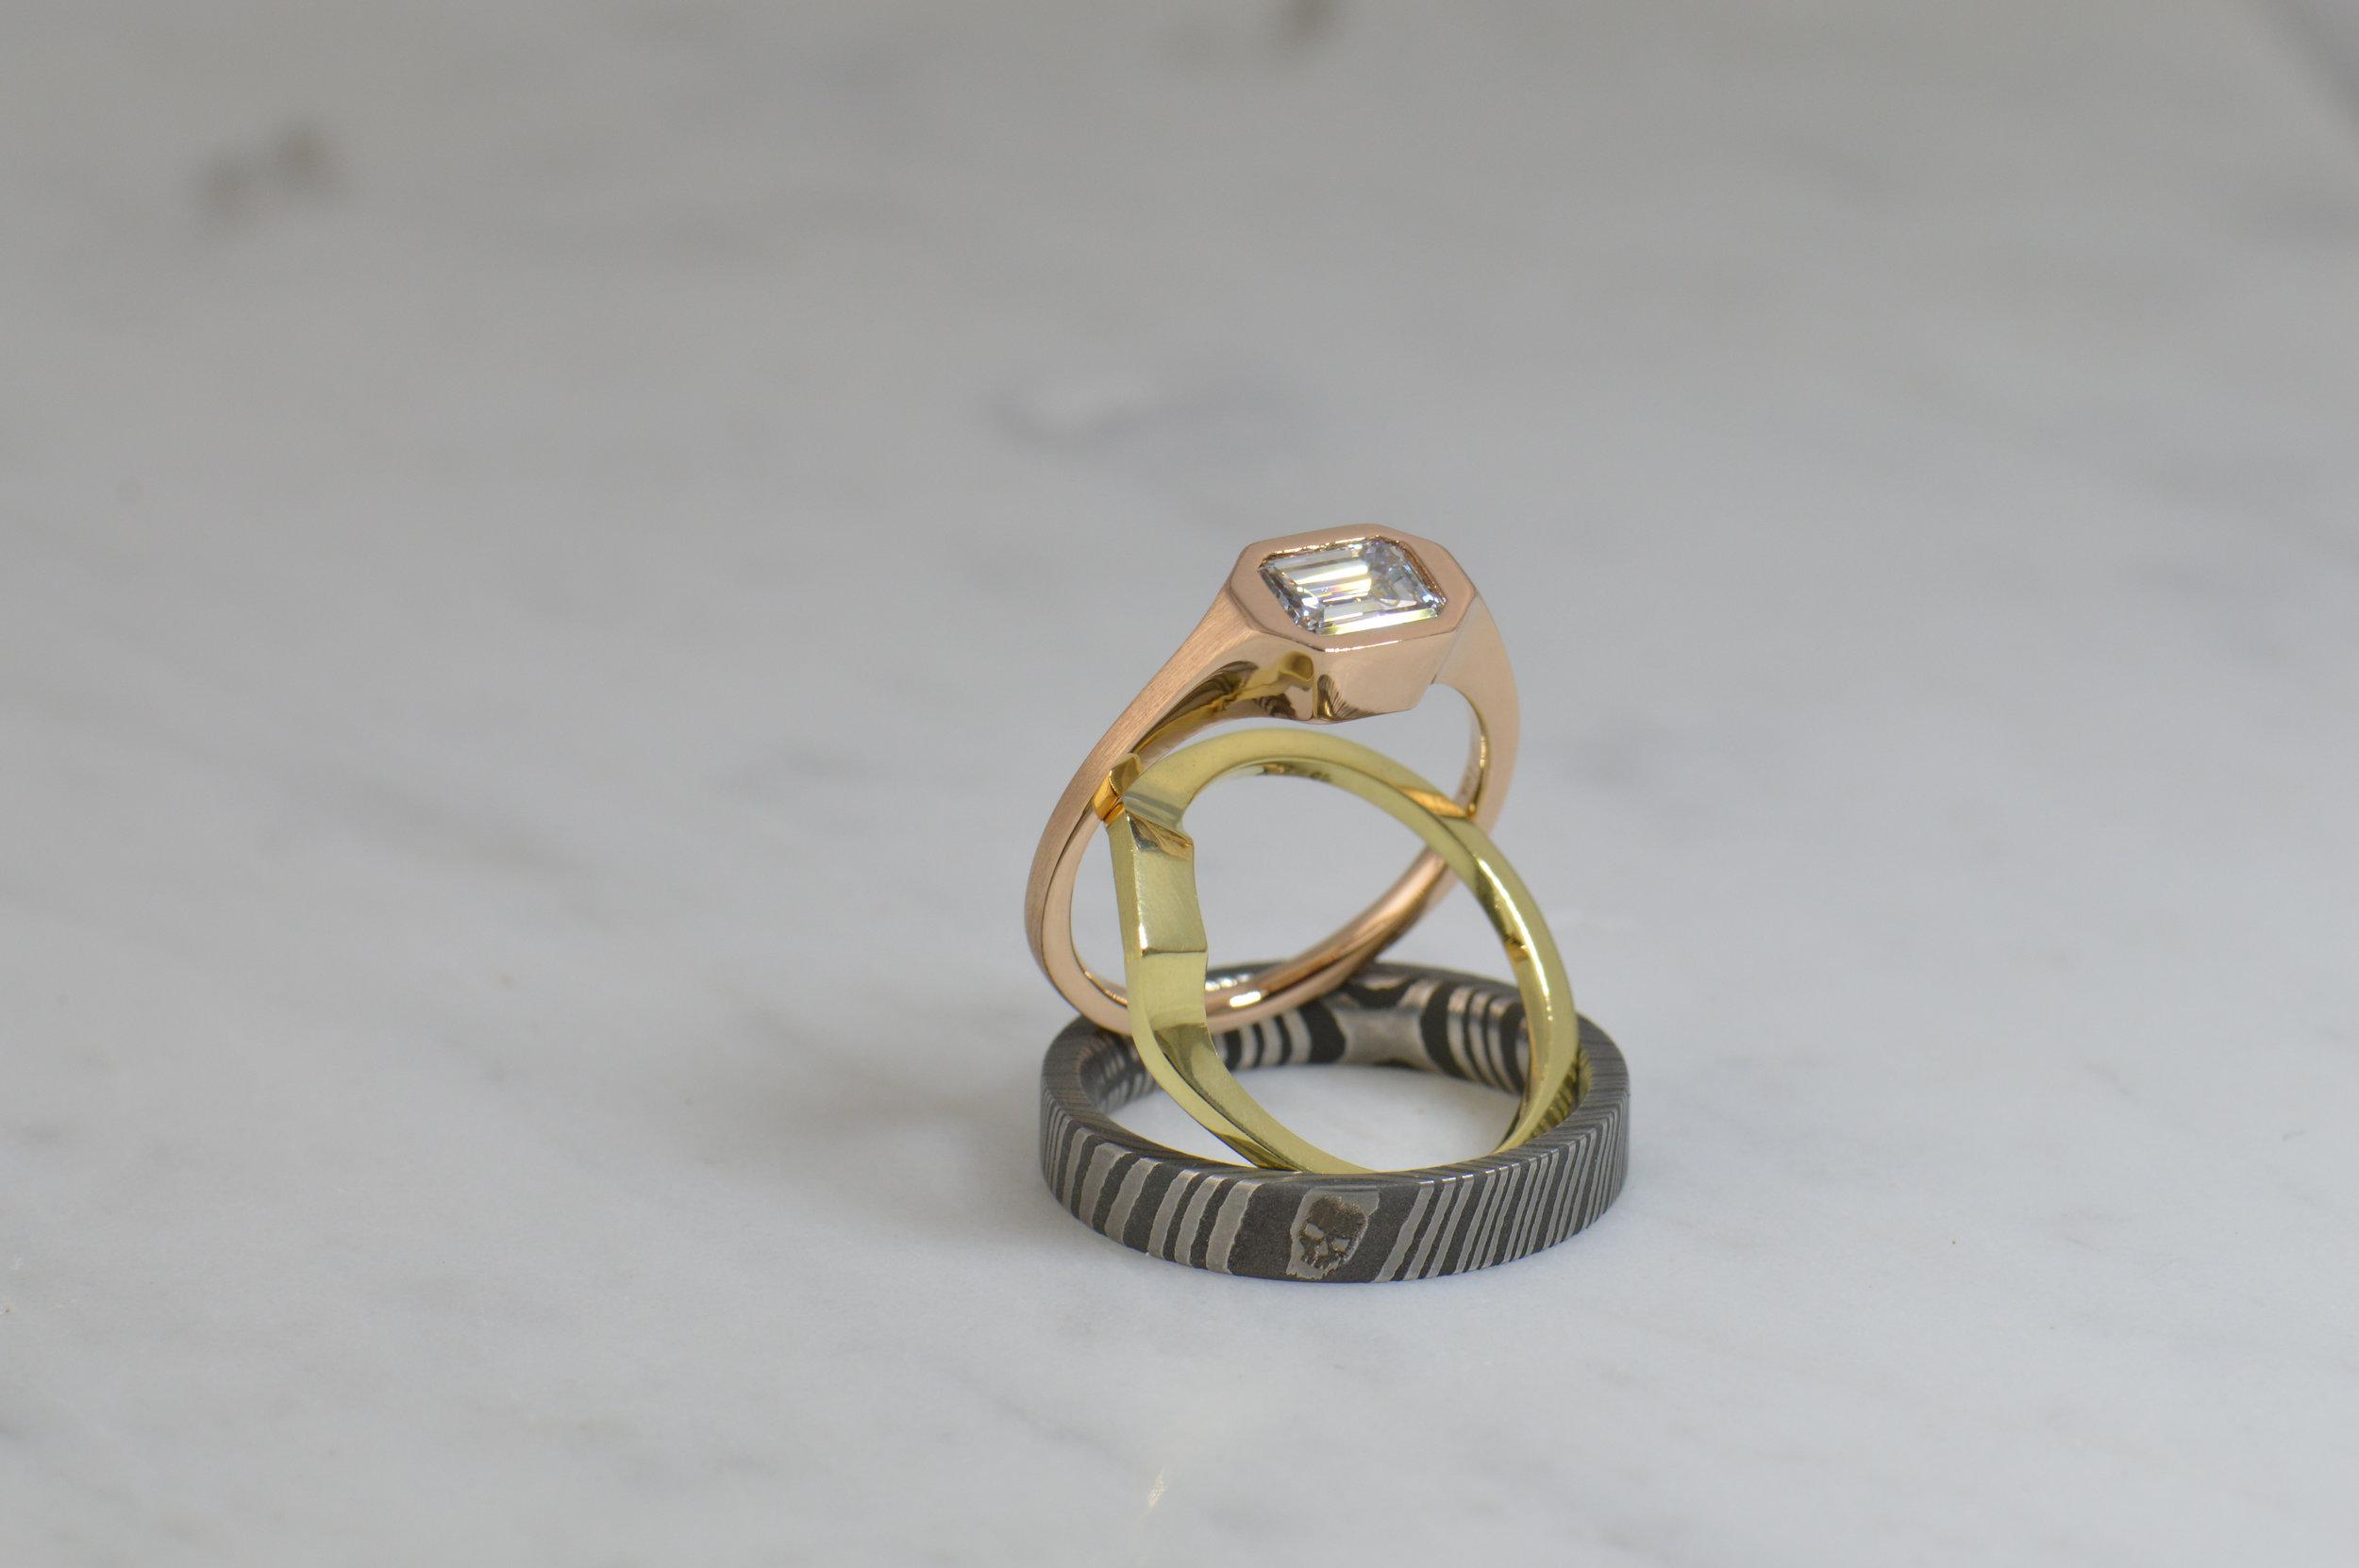 darvier-damascus-wedding-set-gold-diamond.JPG